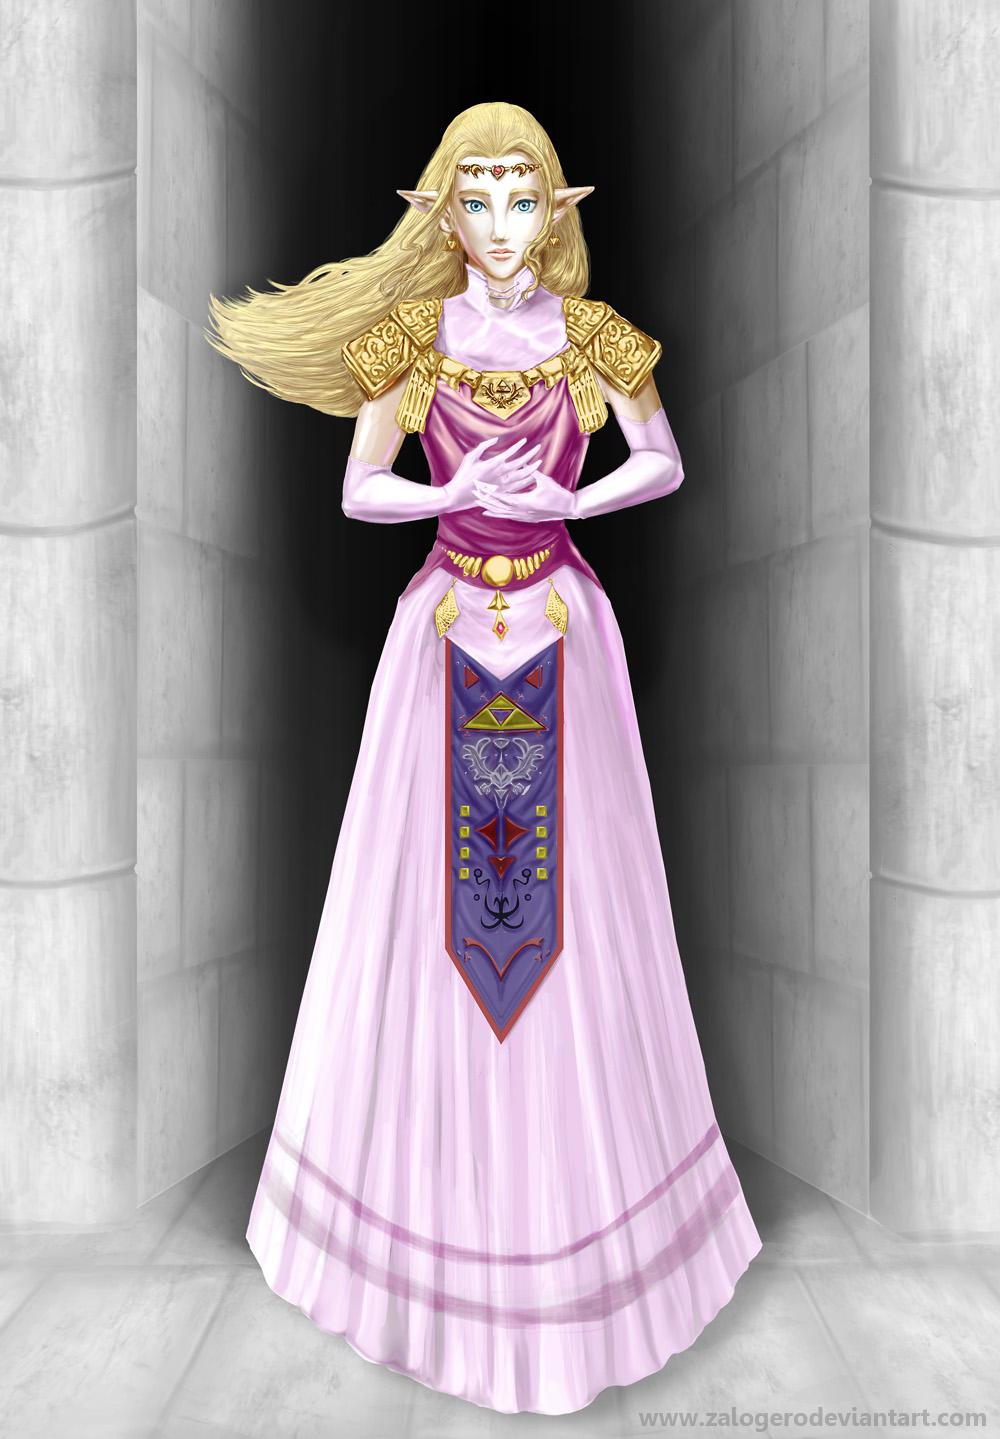 Princess Zelda Ocarina of time by ZaloHero